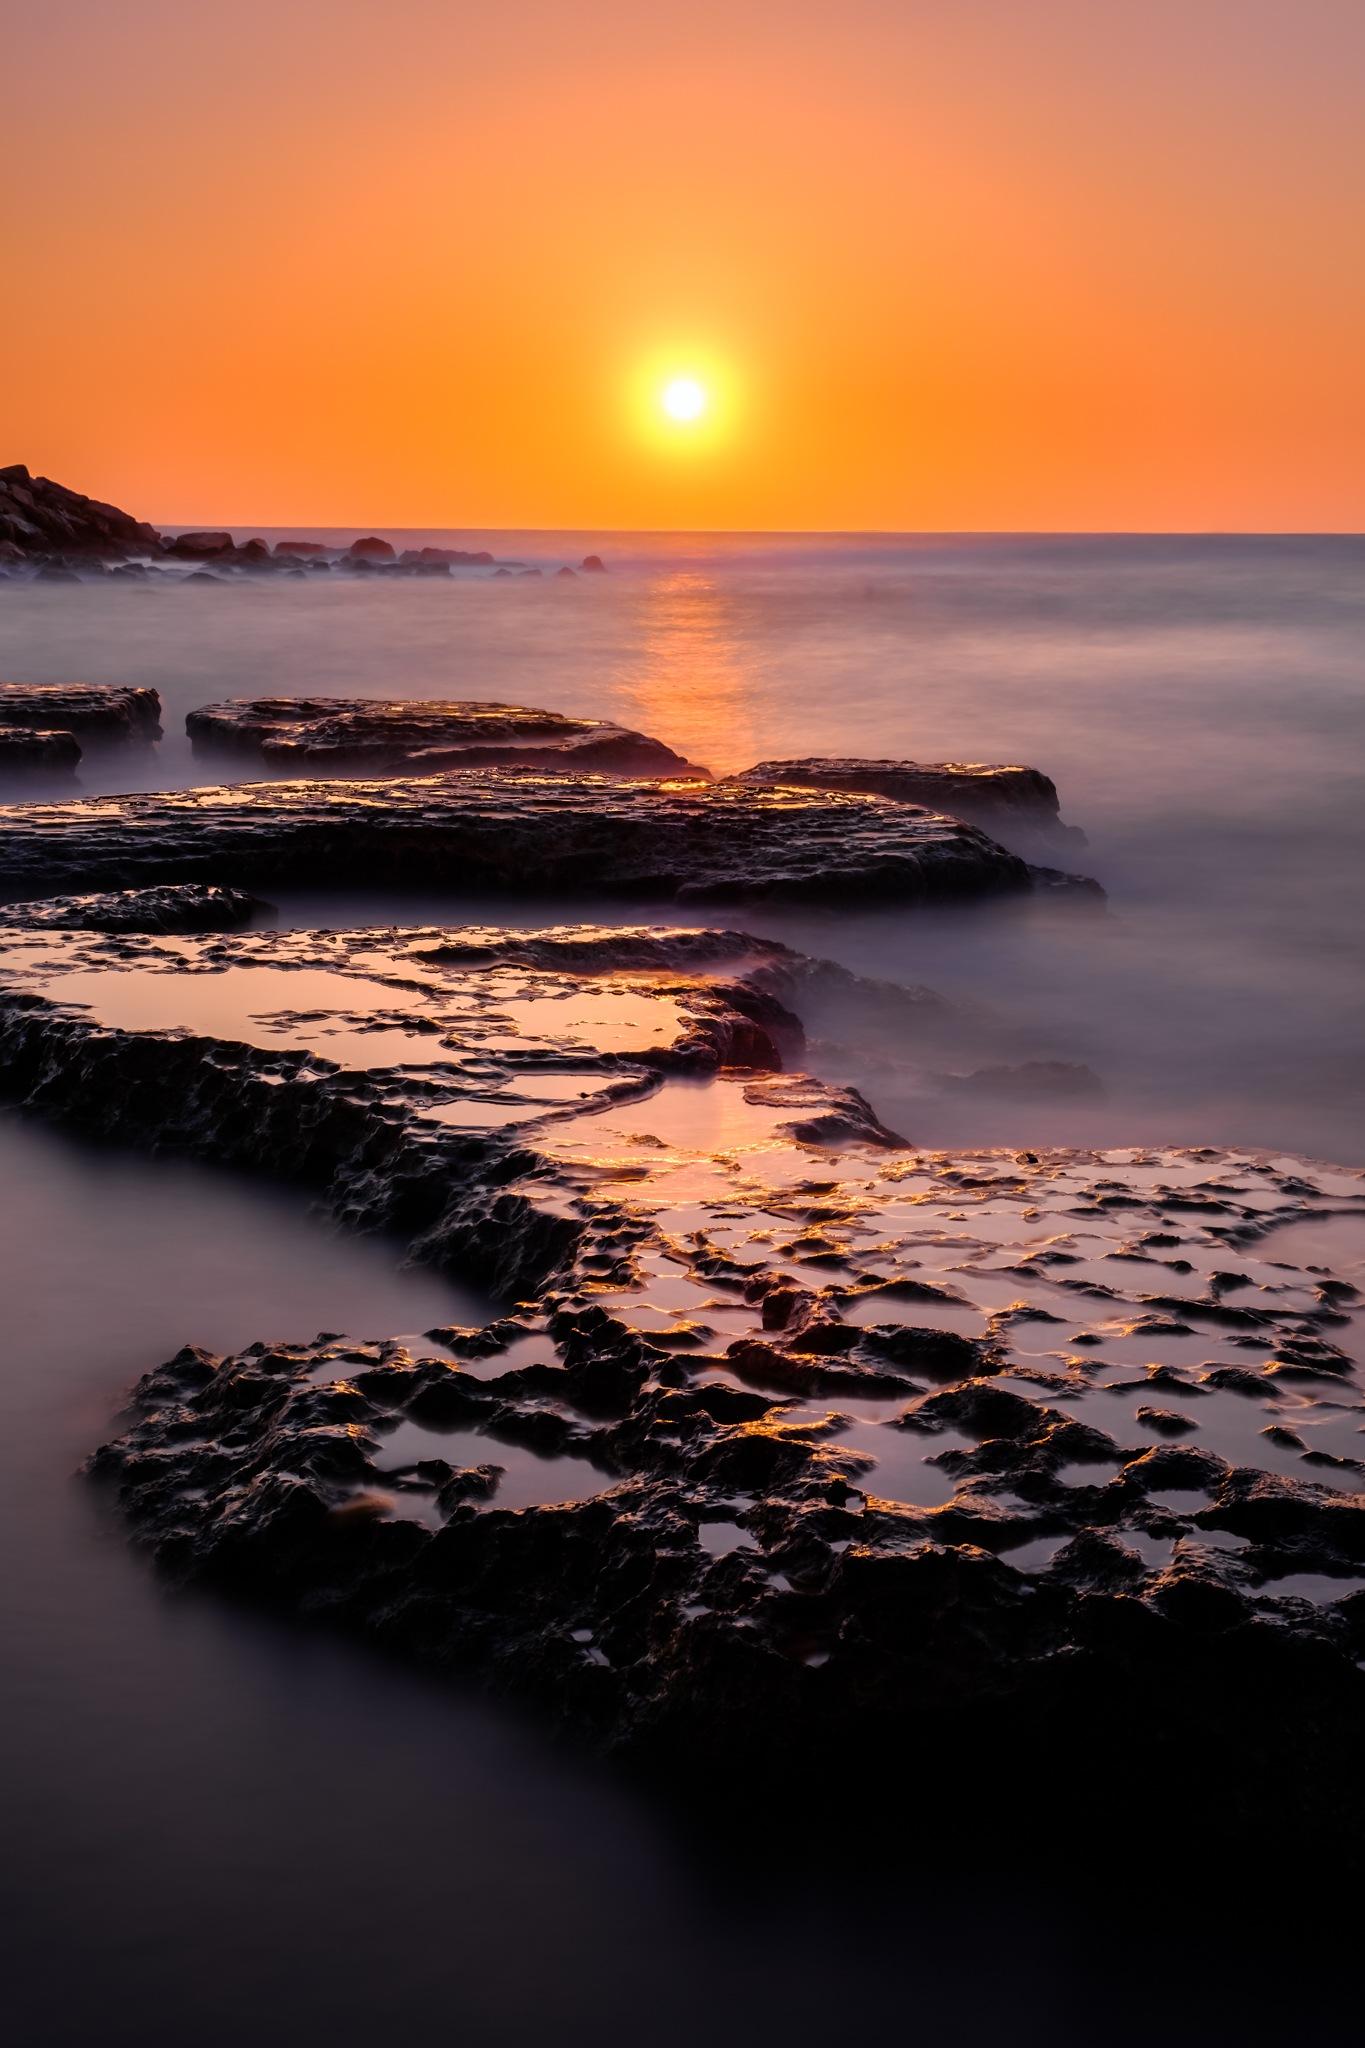 Sunset at Byblos by Alex Maxqvist